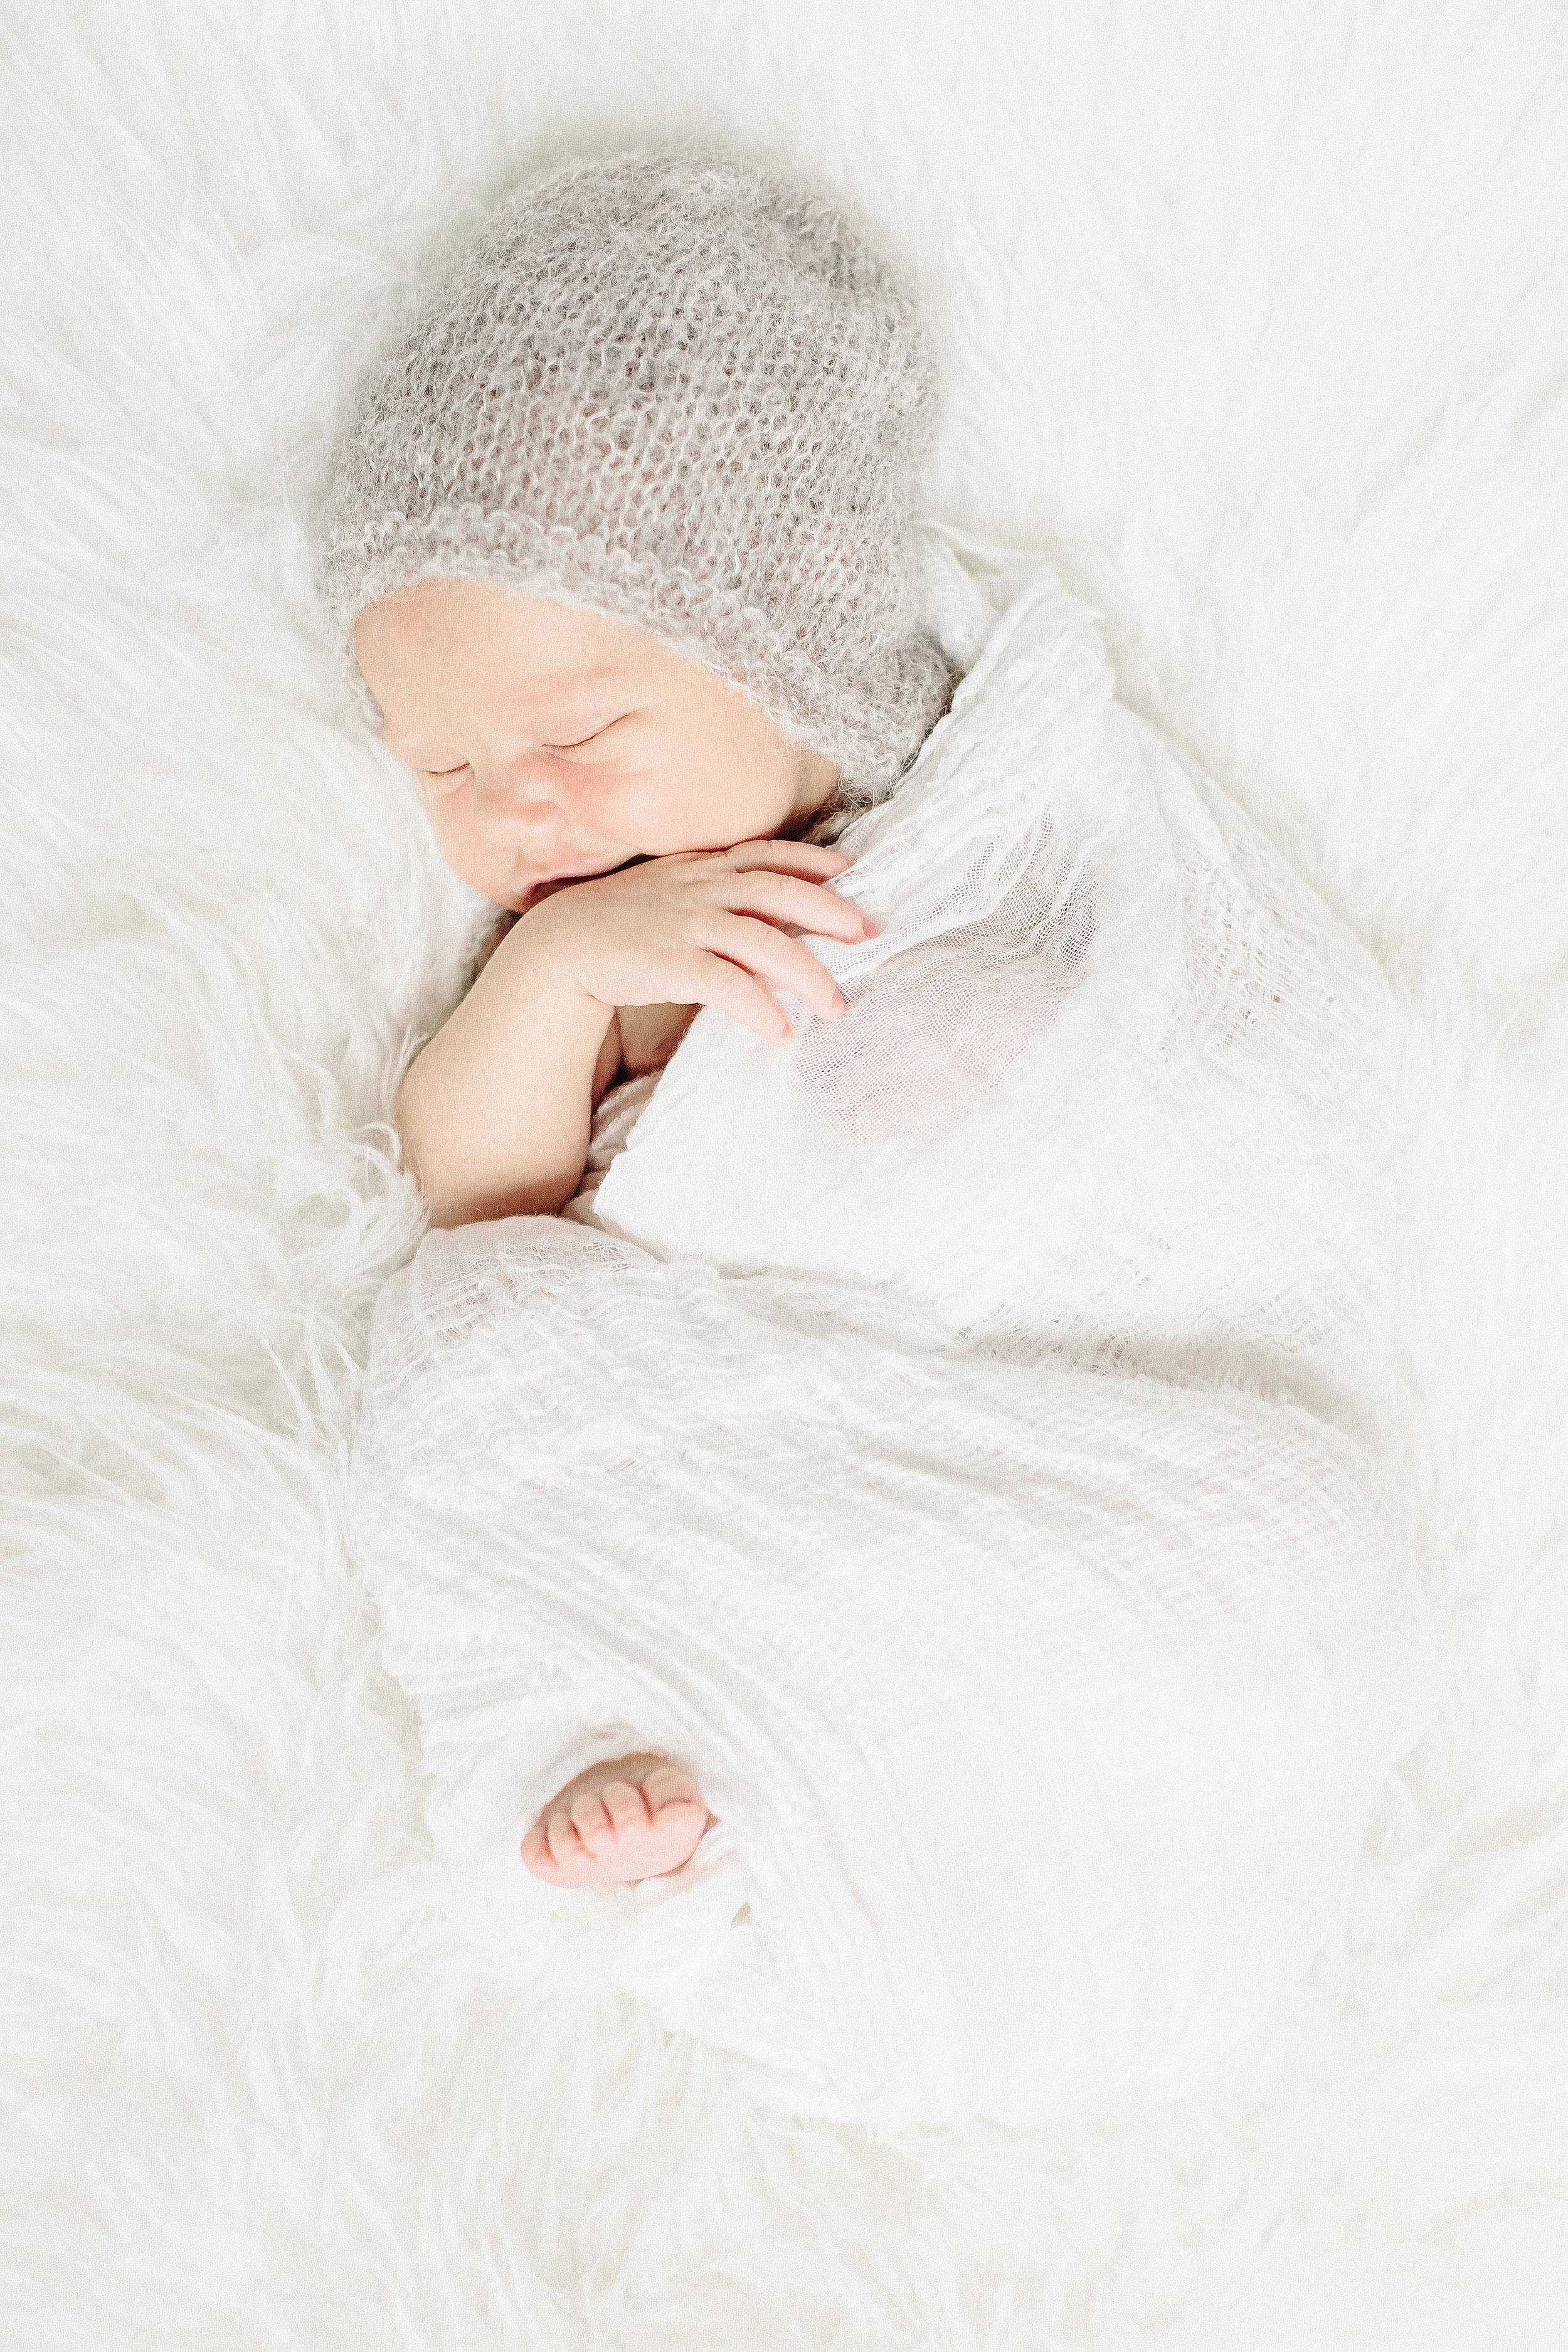 Sleeping Baby in Gray Knit Hat | Cassie Schott Photography